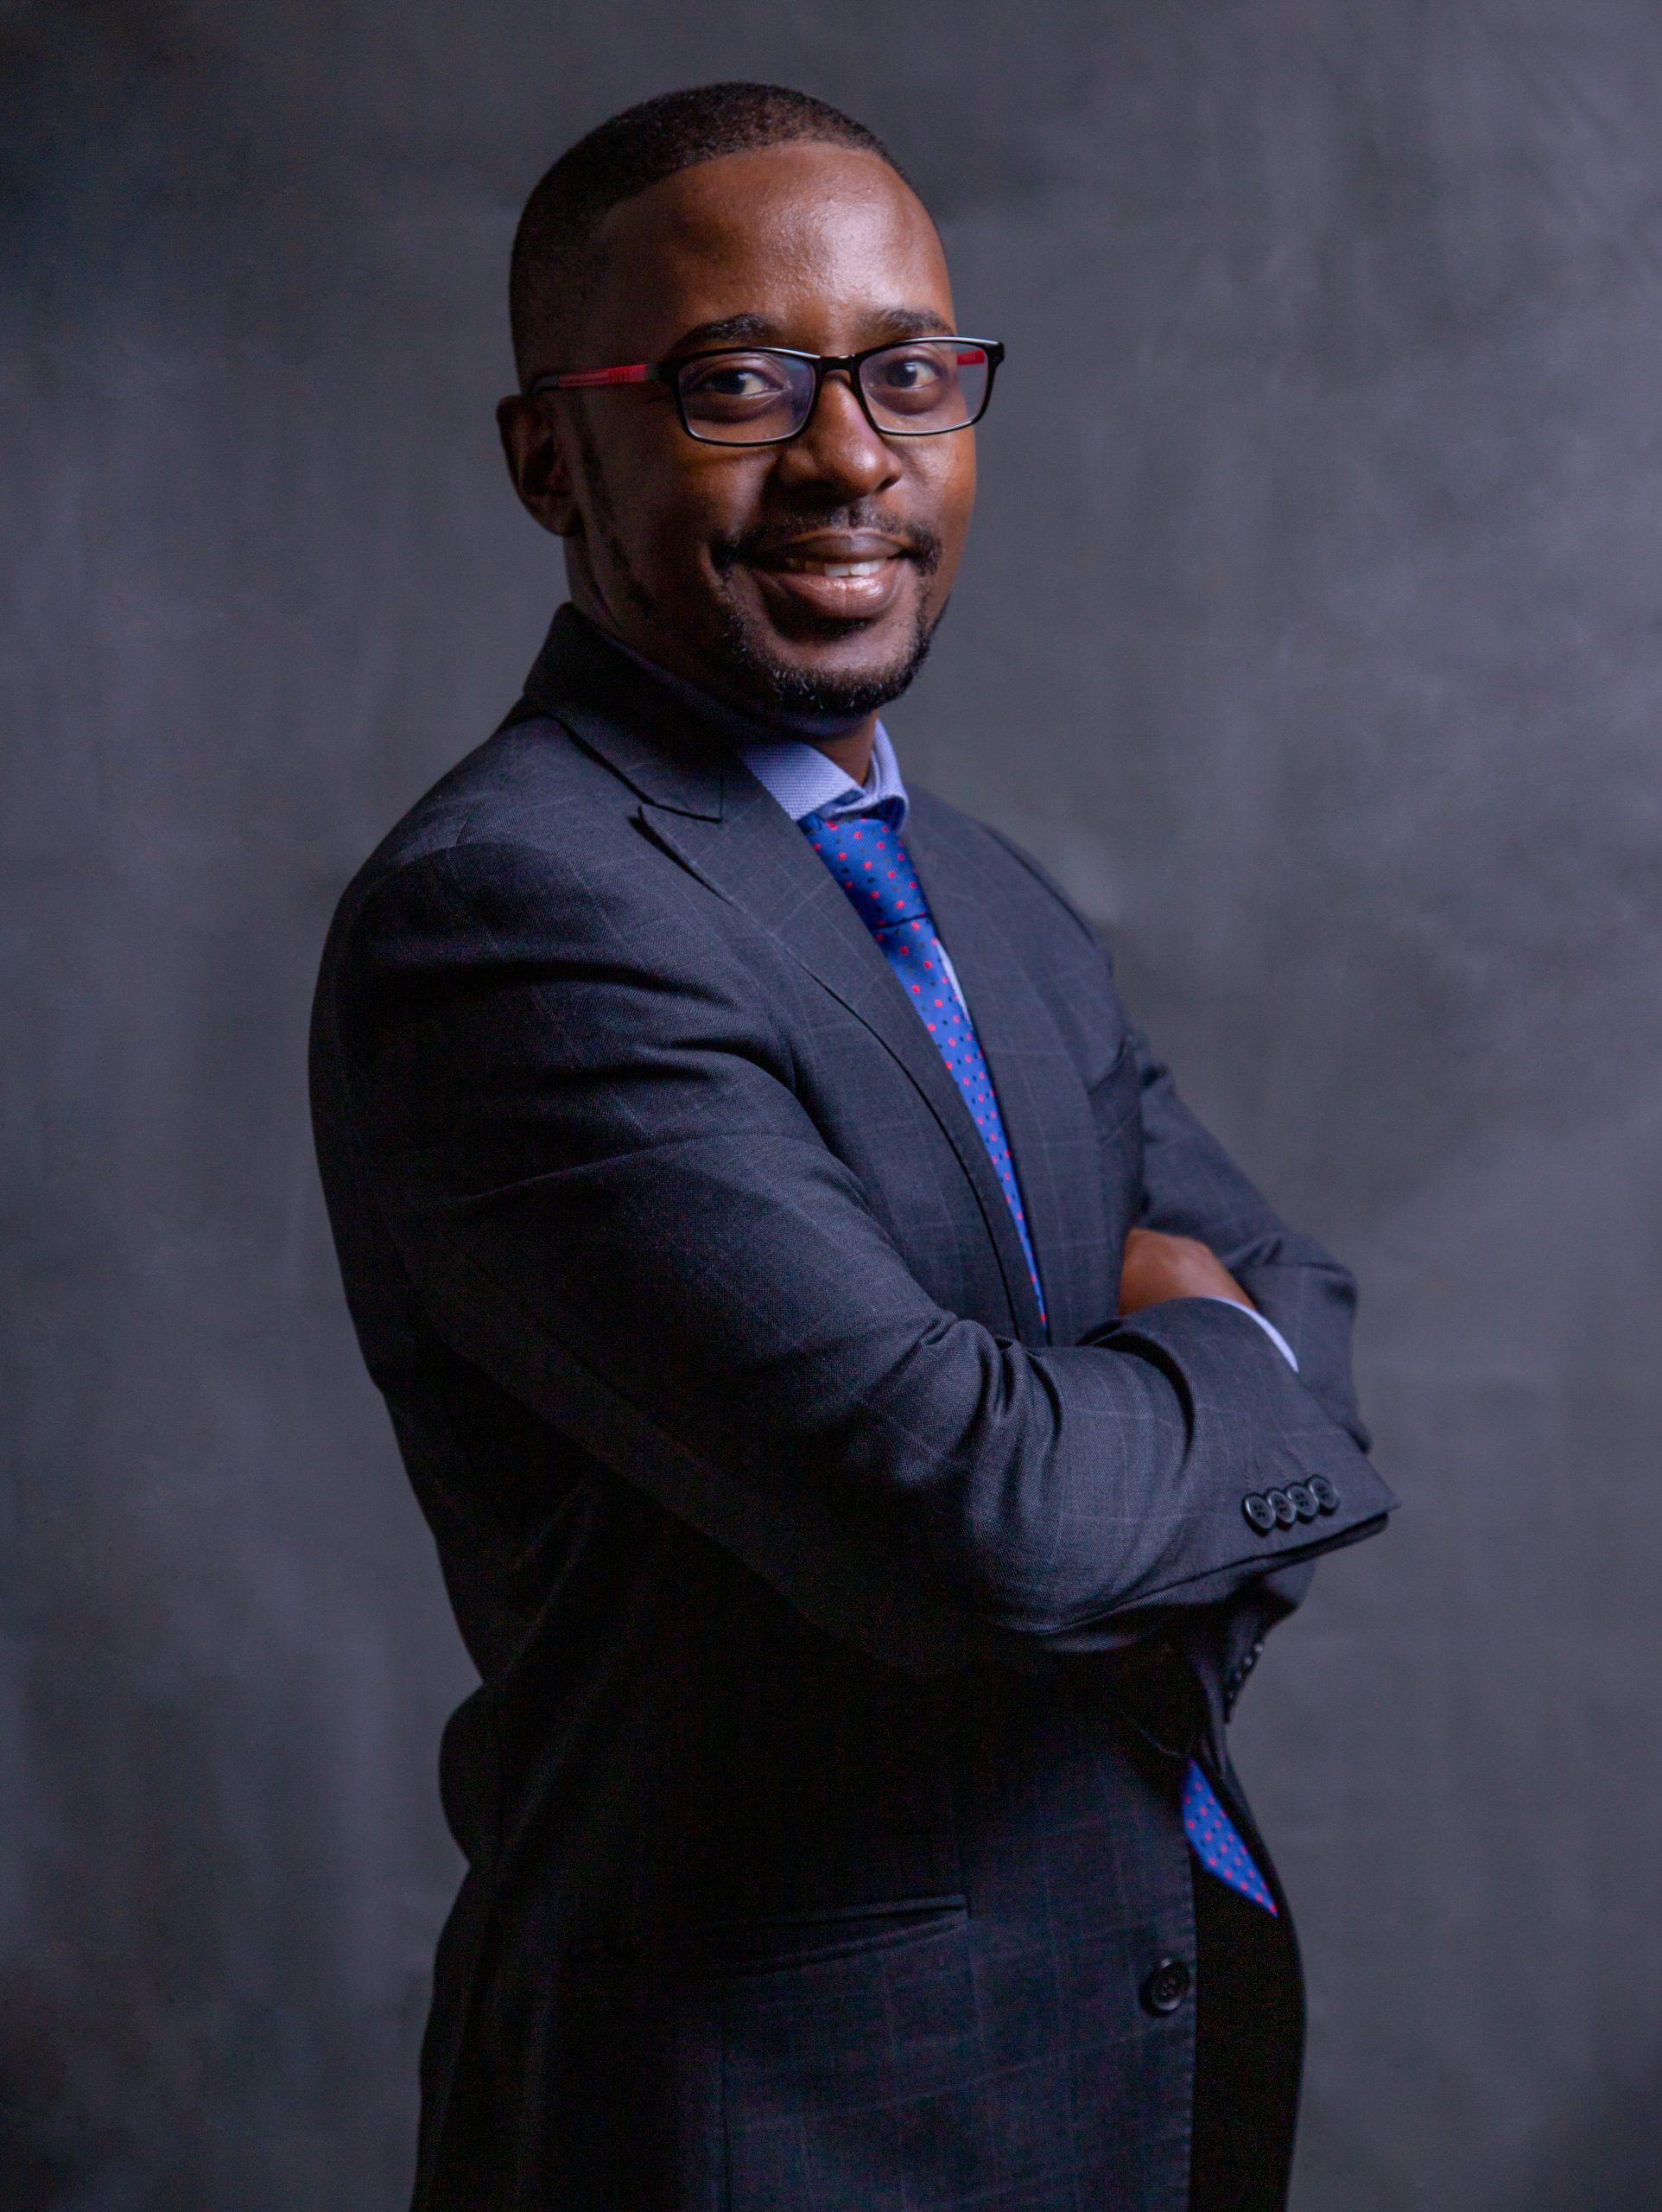 Peter Kawunmi